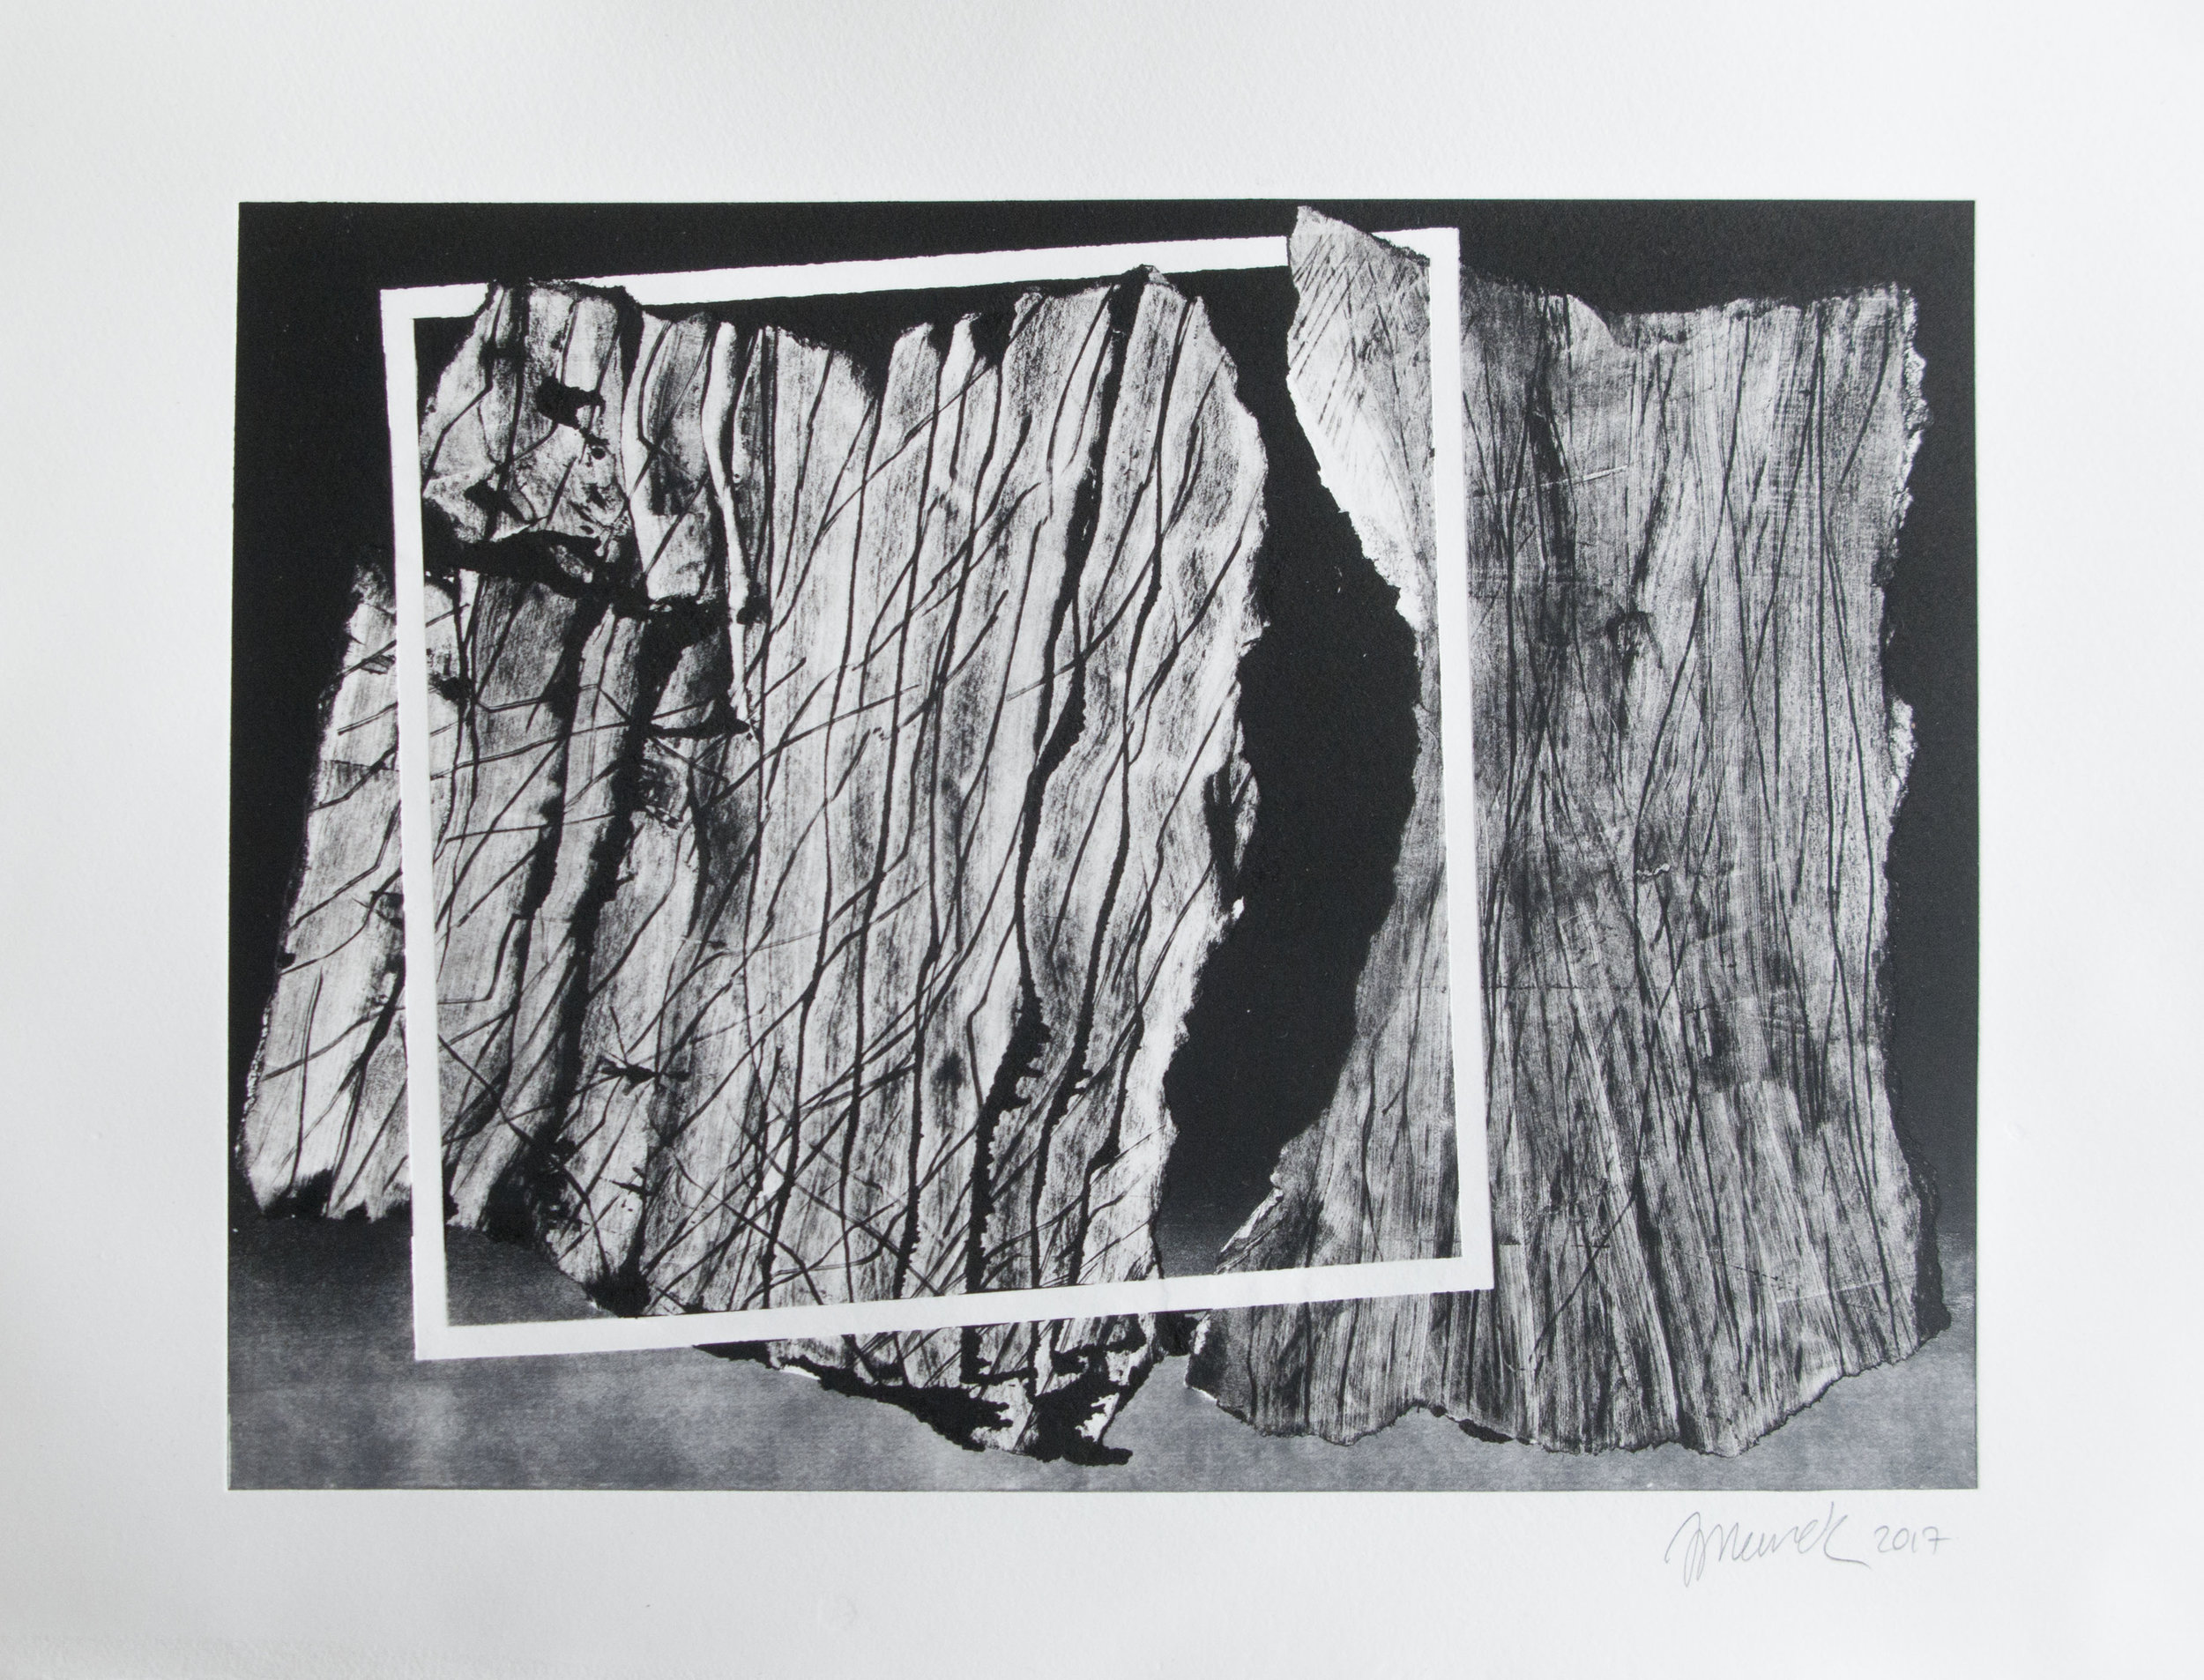 Forms on black 19 (32cm x 26 cm)